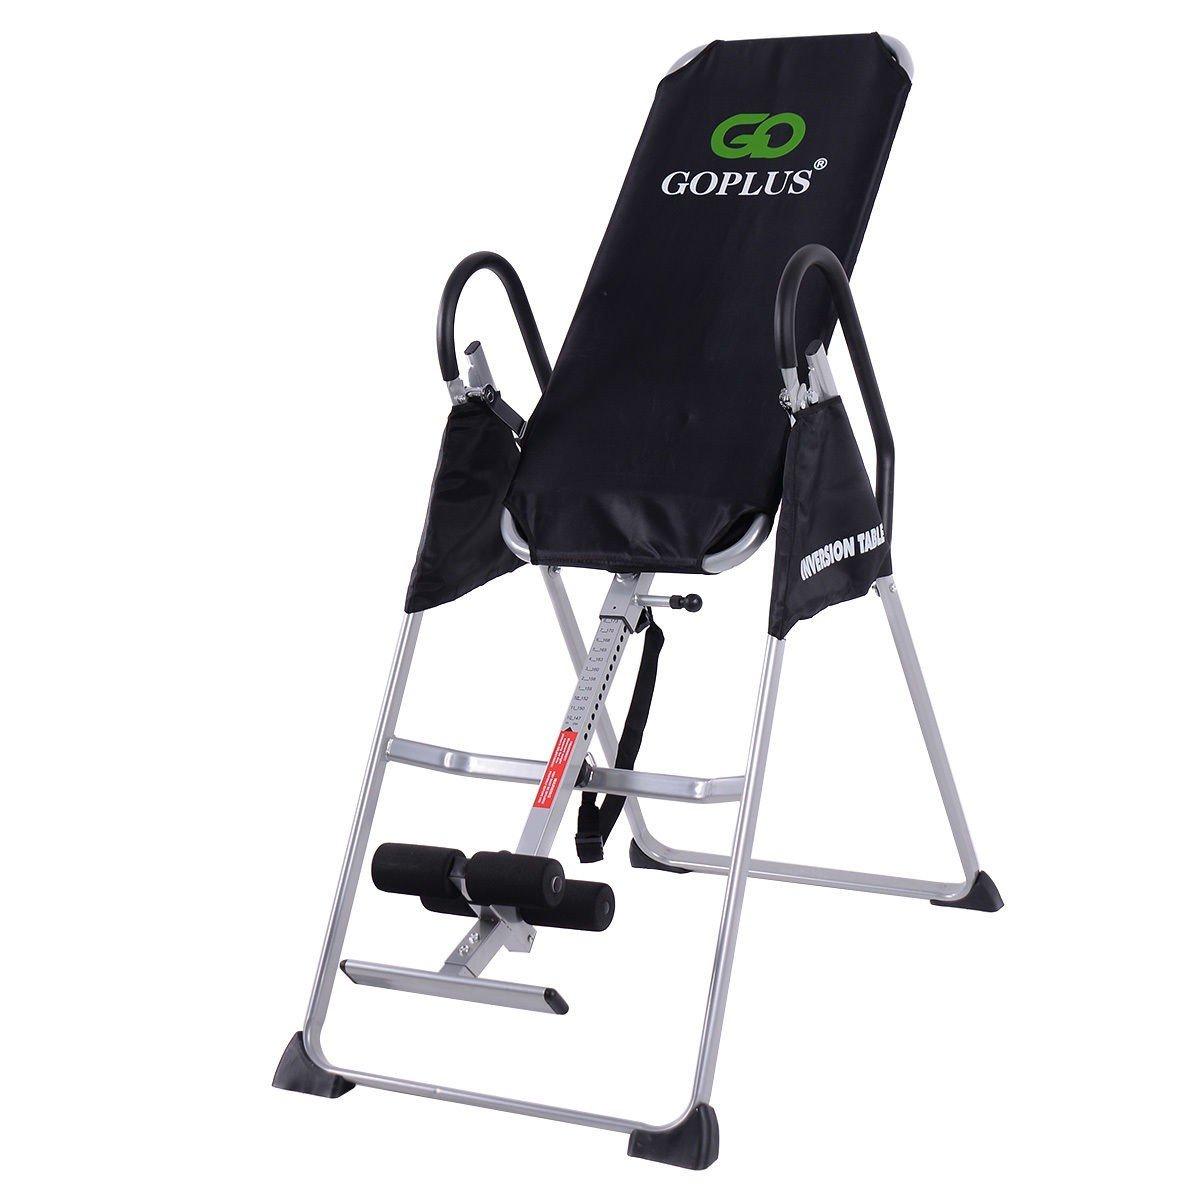 CHOOSEandBUY Foldable Premium Gravity Back Fitness Inversion Table House Us Exercise Workout Innova